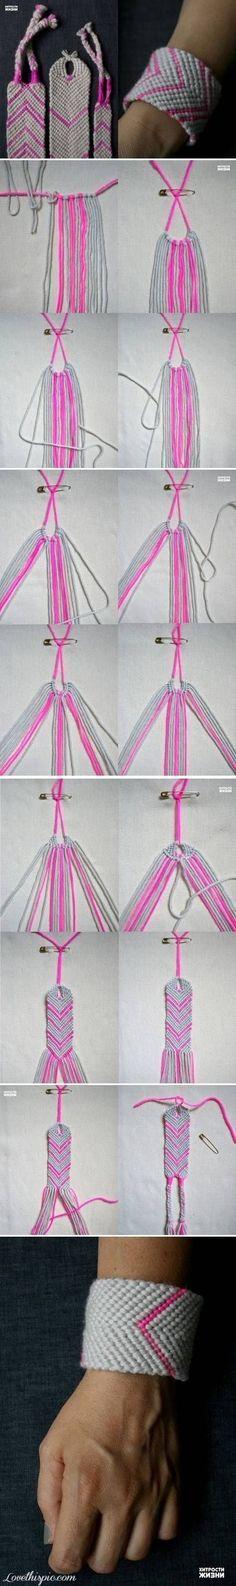 DIY-Flitter Webart-Armband DIY Handwerk Ideen einfach craftsDIY Ideen listig leicht DIY DIY Schmuck DIY Armband Handwerk Armband Schmuck diy